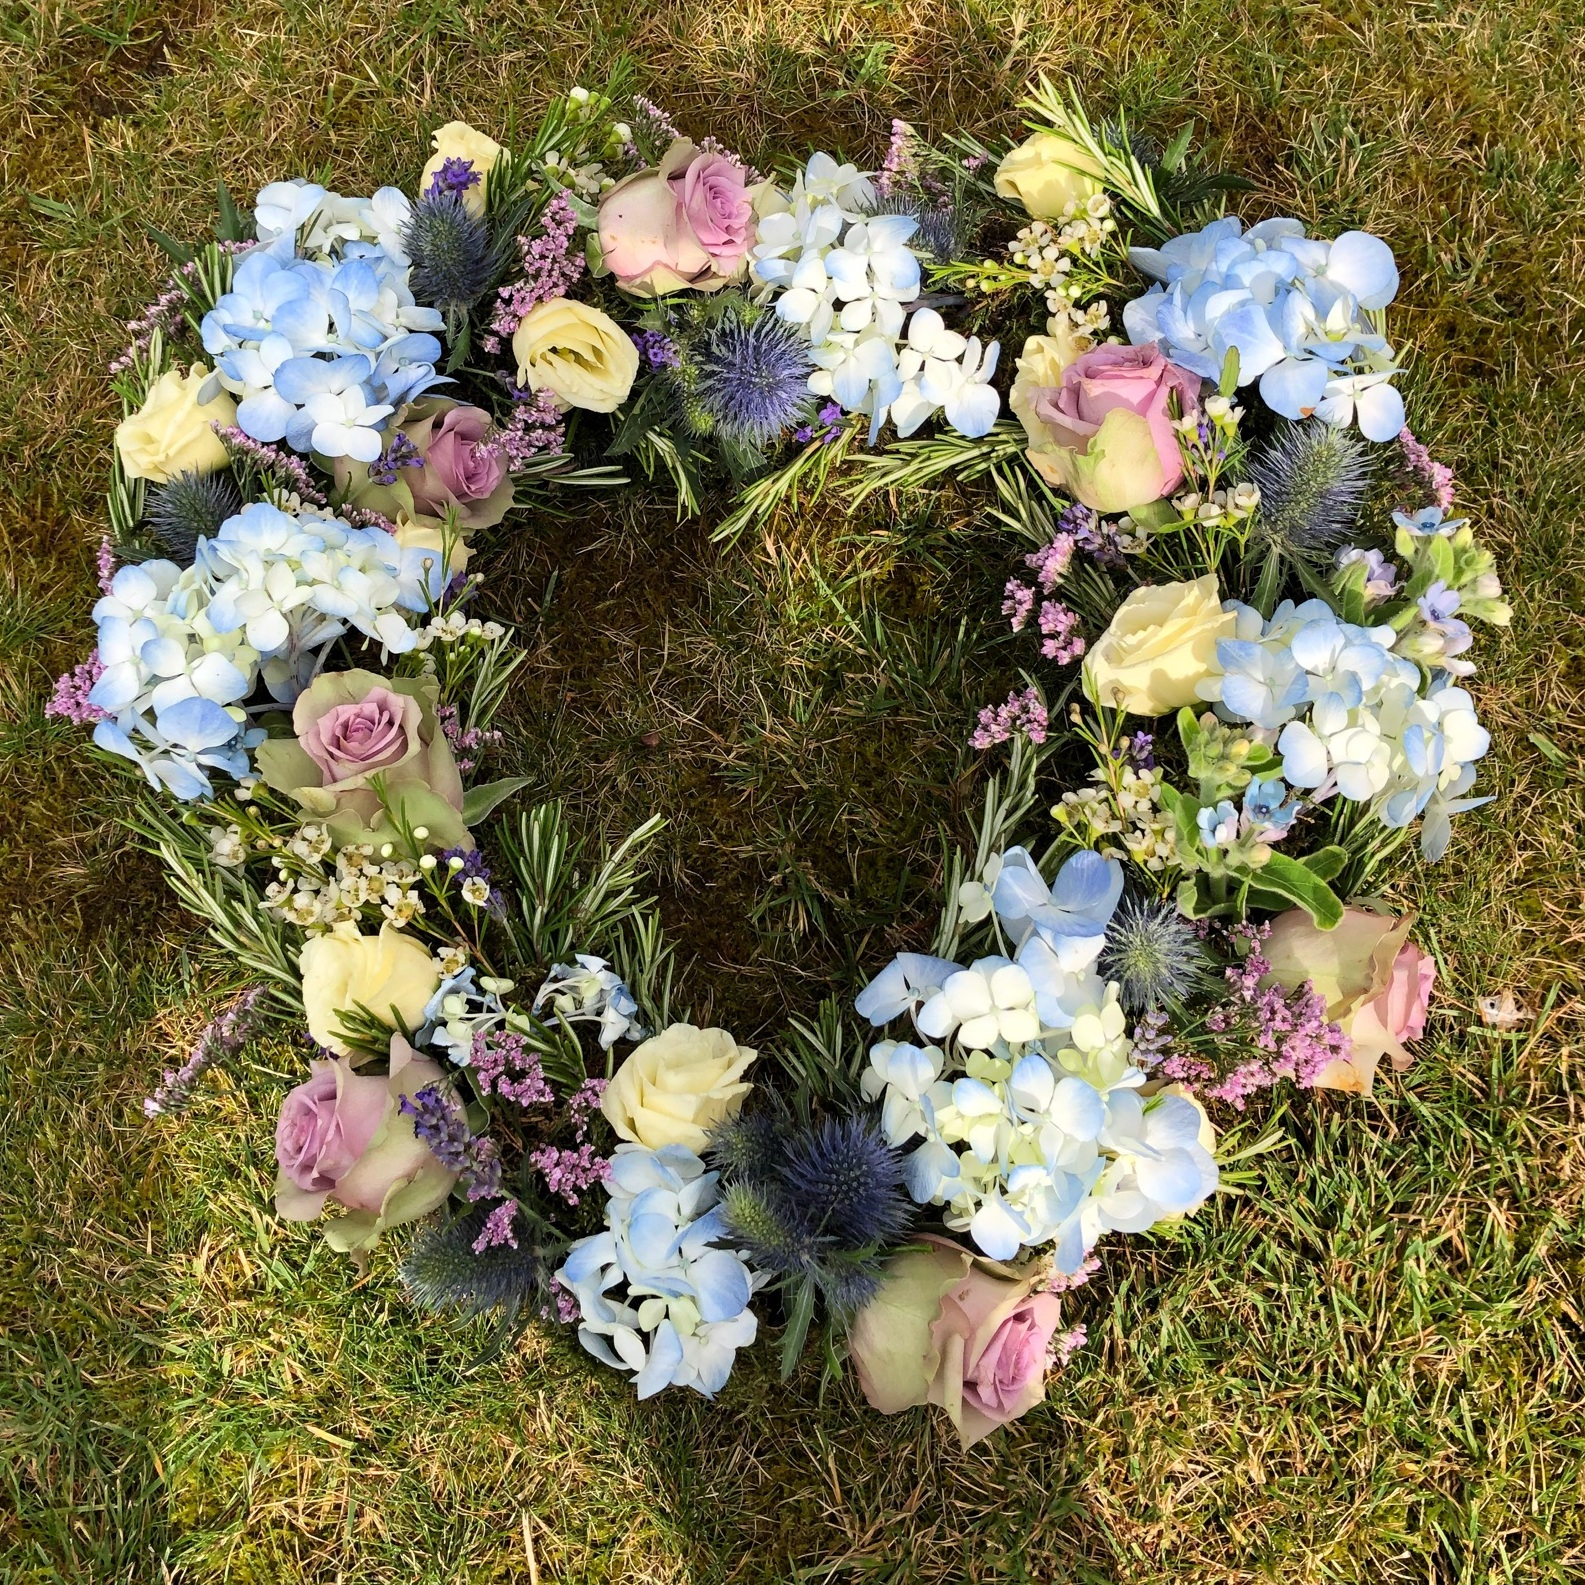 hearttributeincountrygardenflowers.jpg